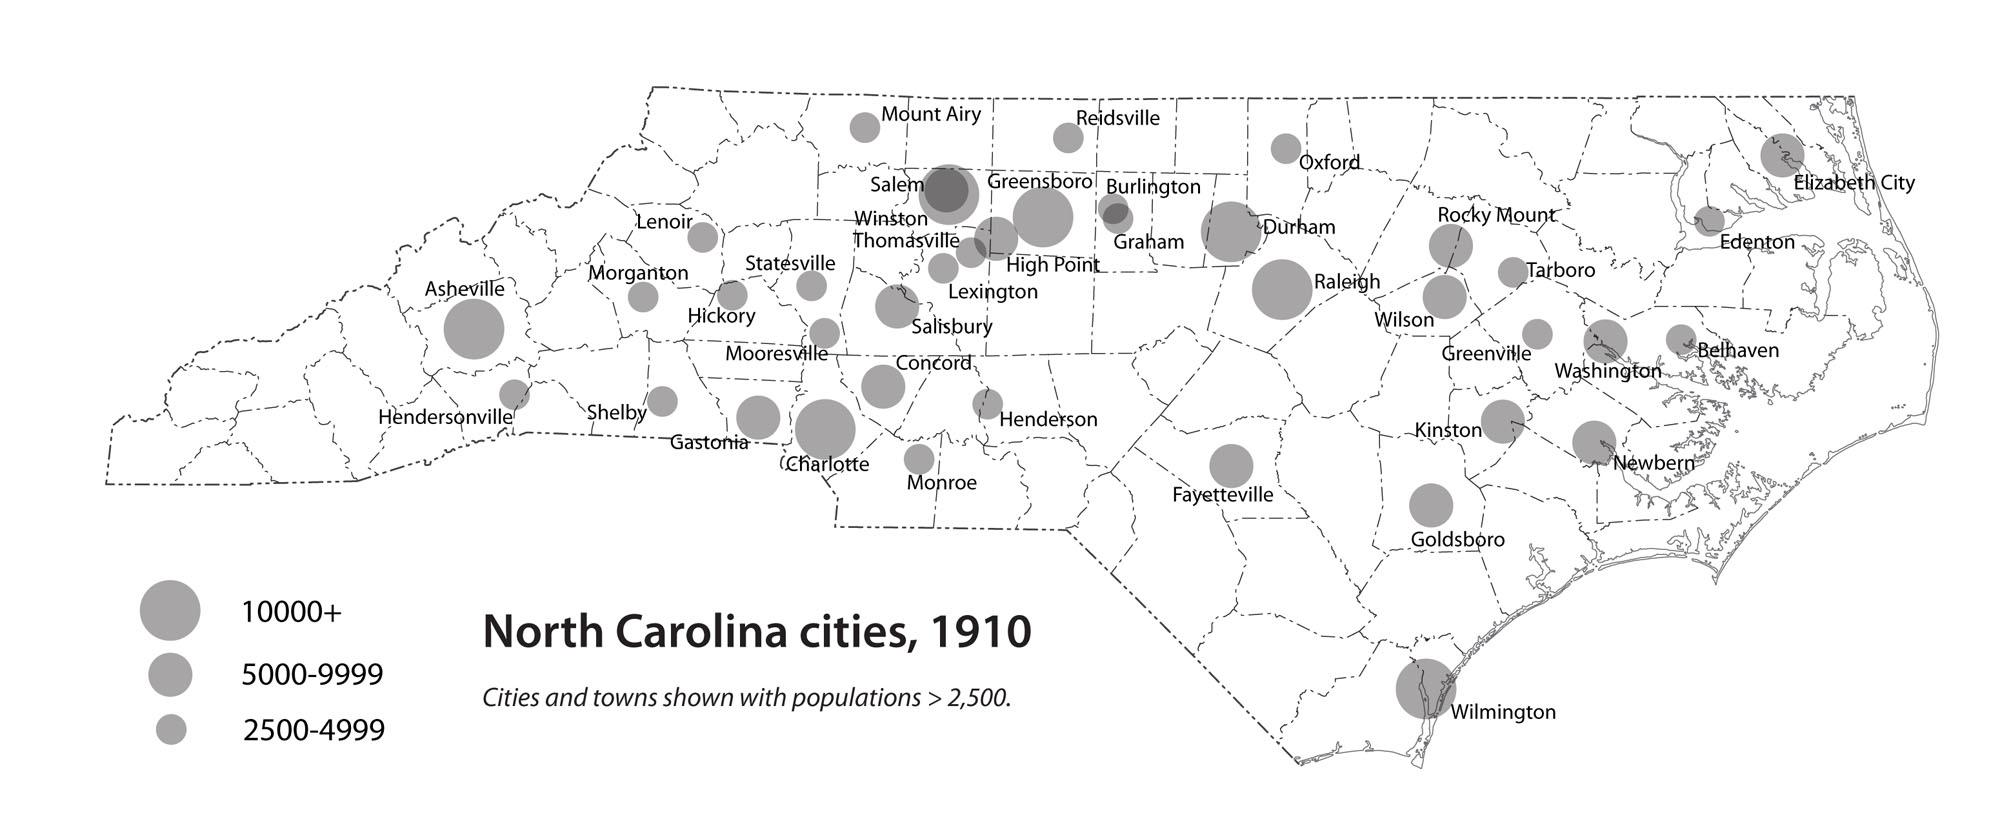 Ncpedia ncpedia north carolina cities 1910 publicscrutiny Gallery